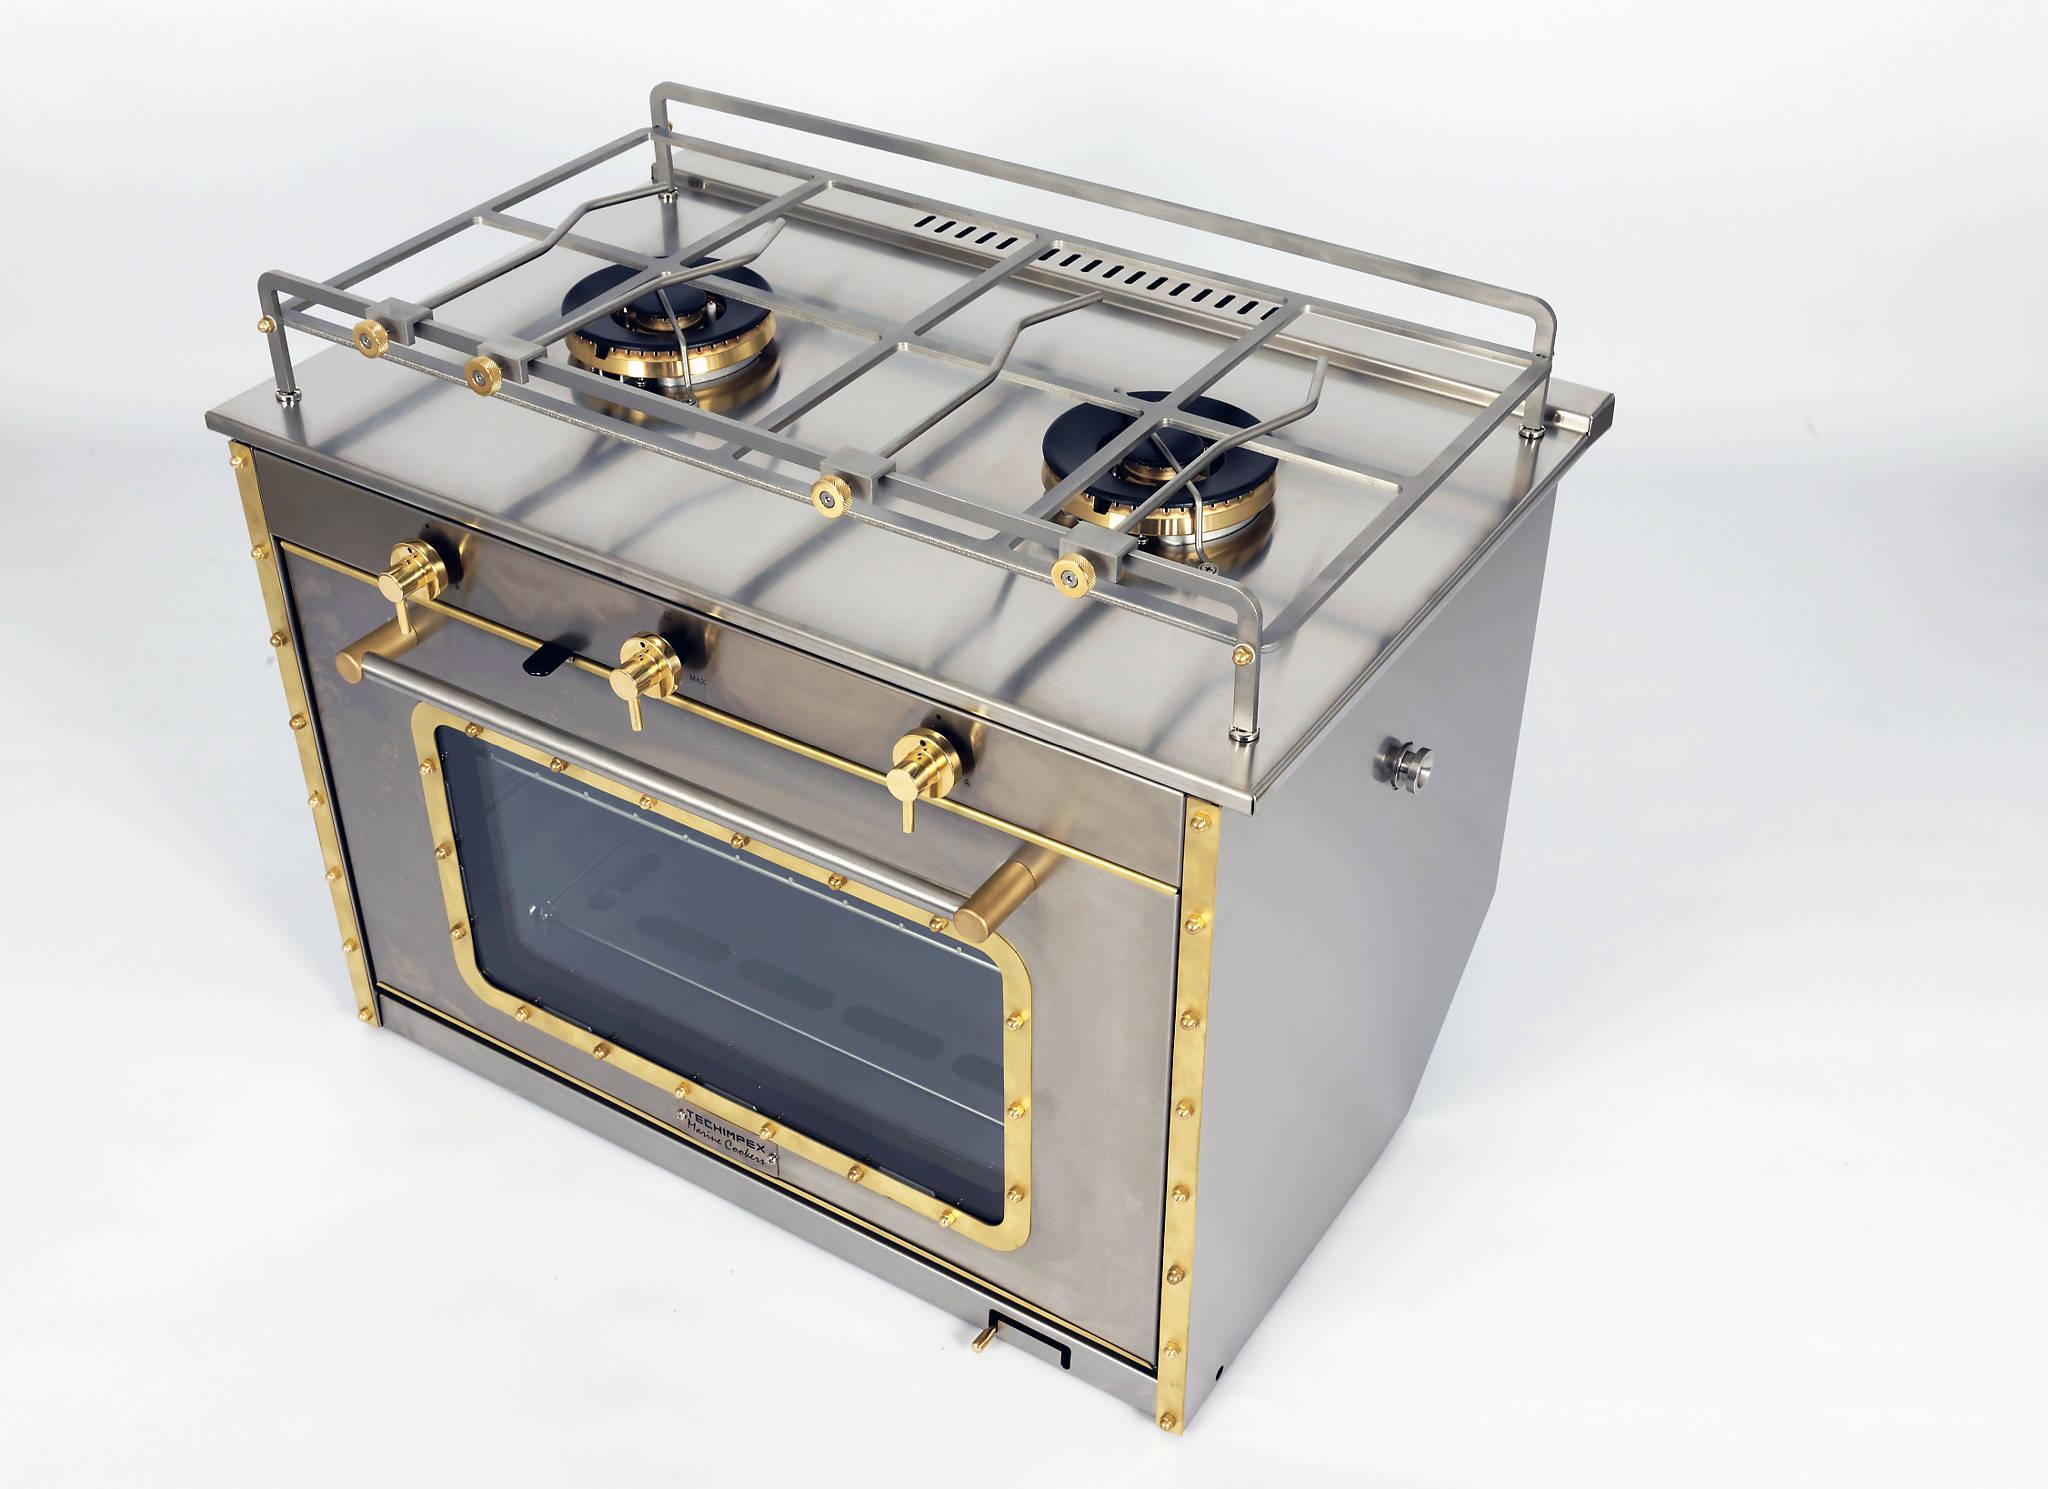 propane stove burner